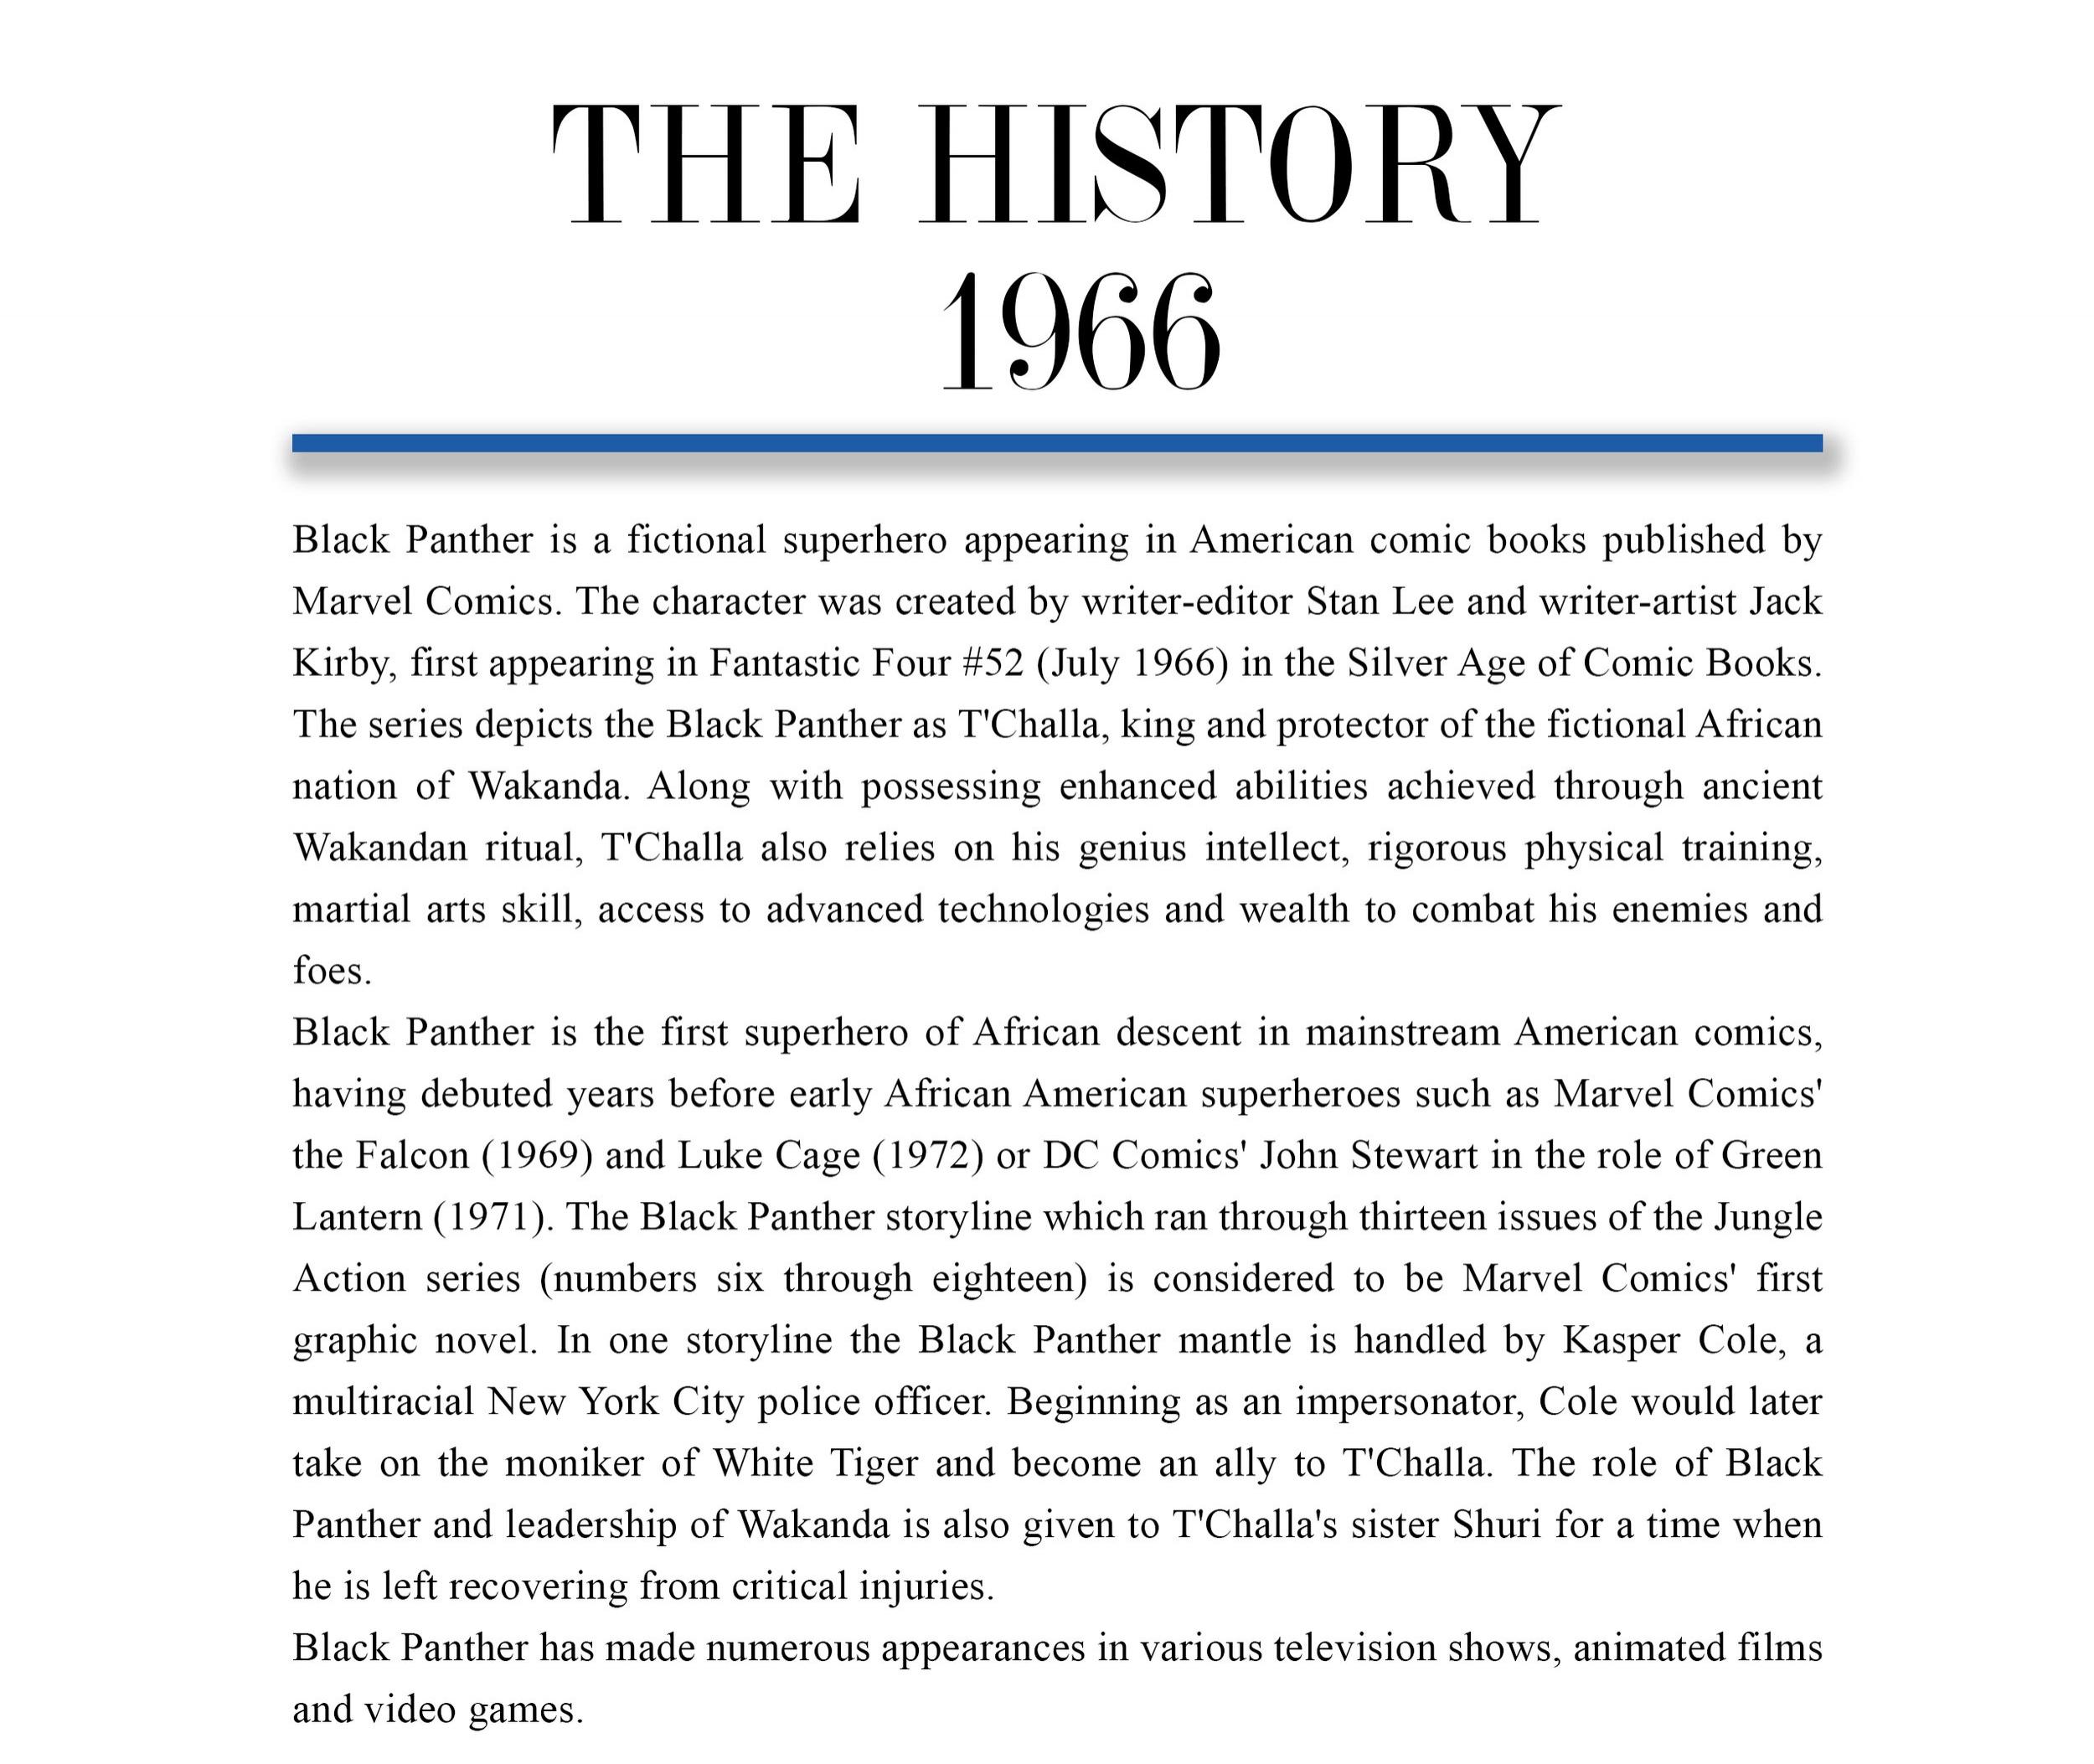 Black_Panther_History.jpg